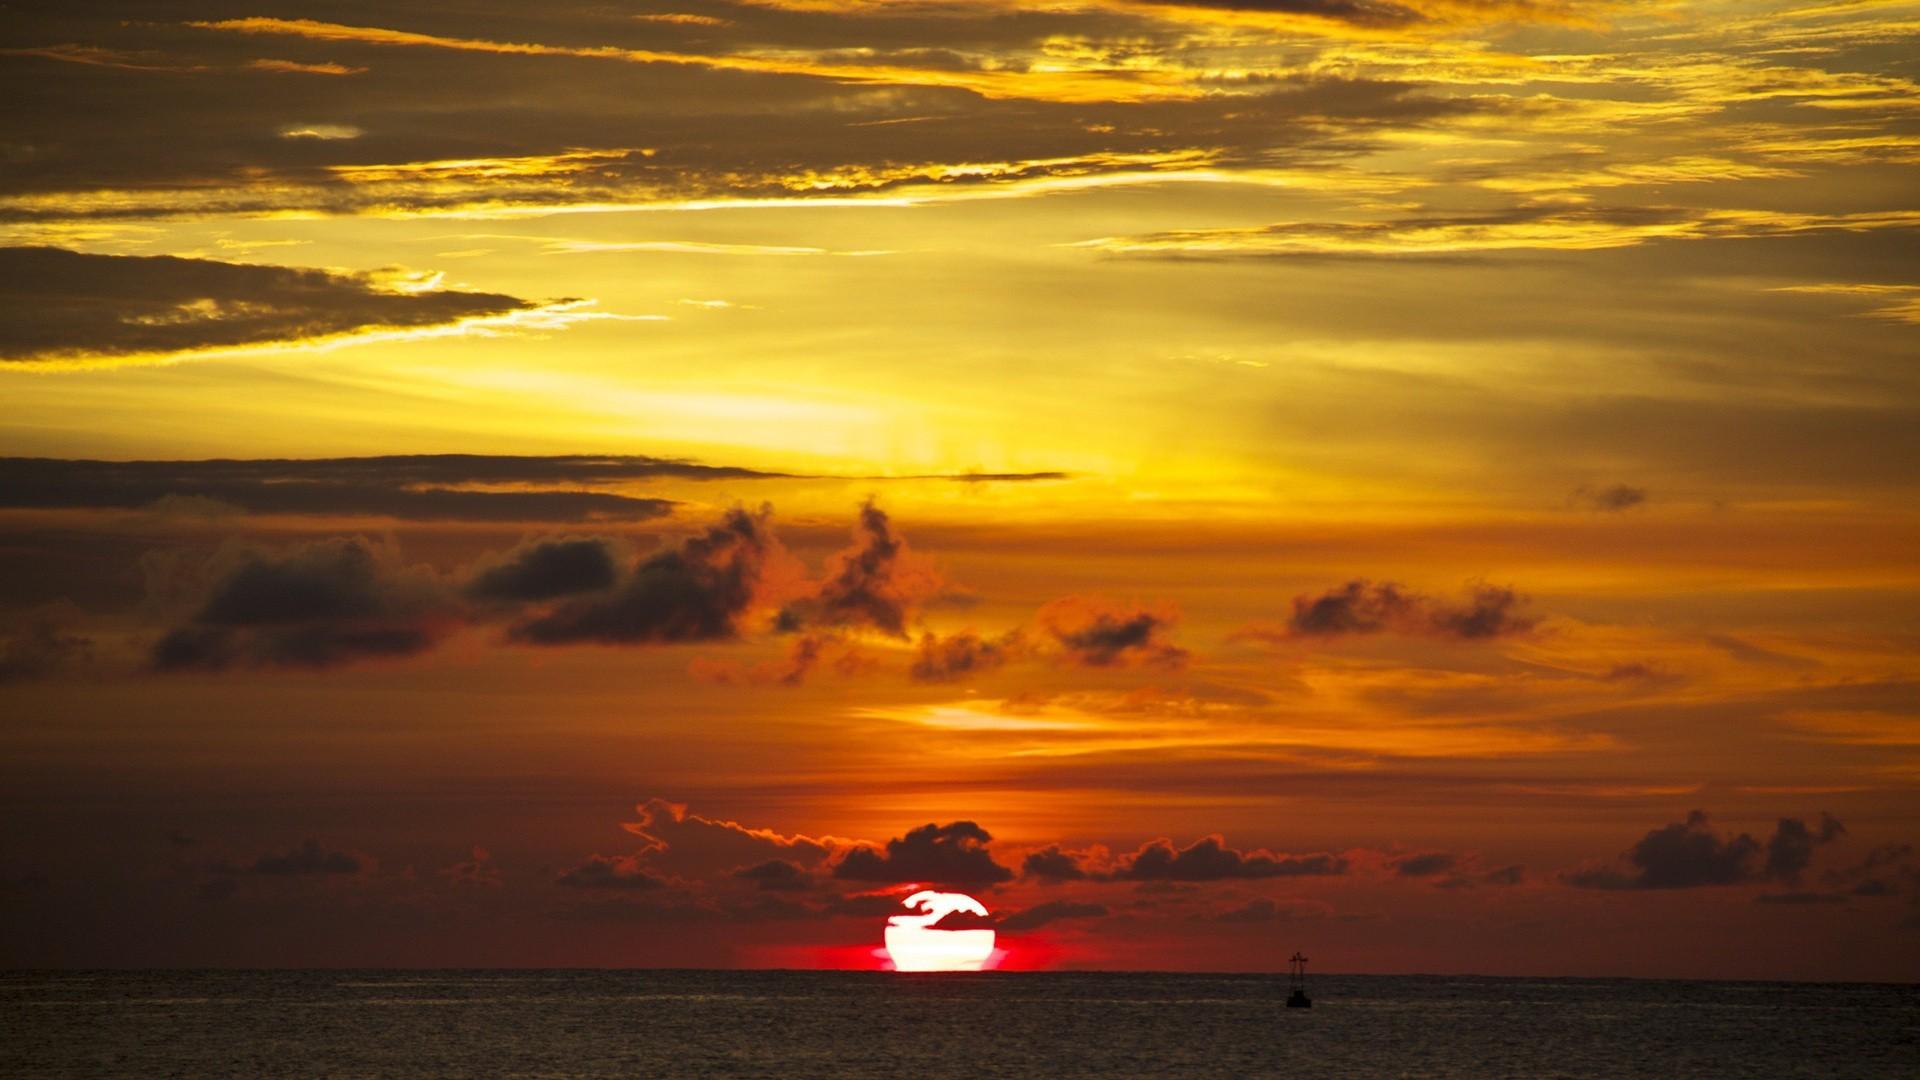 Закат когда закат солнца этим днем